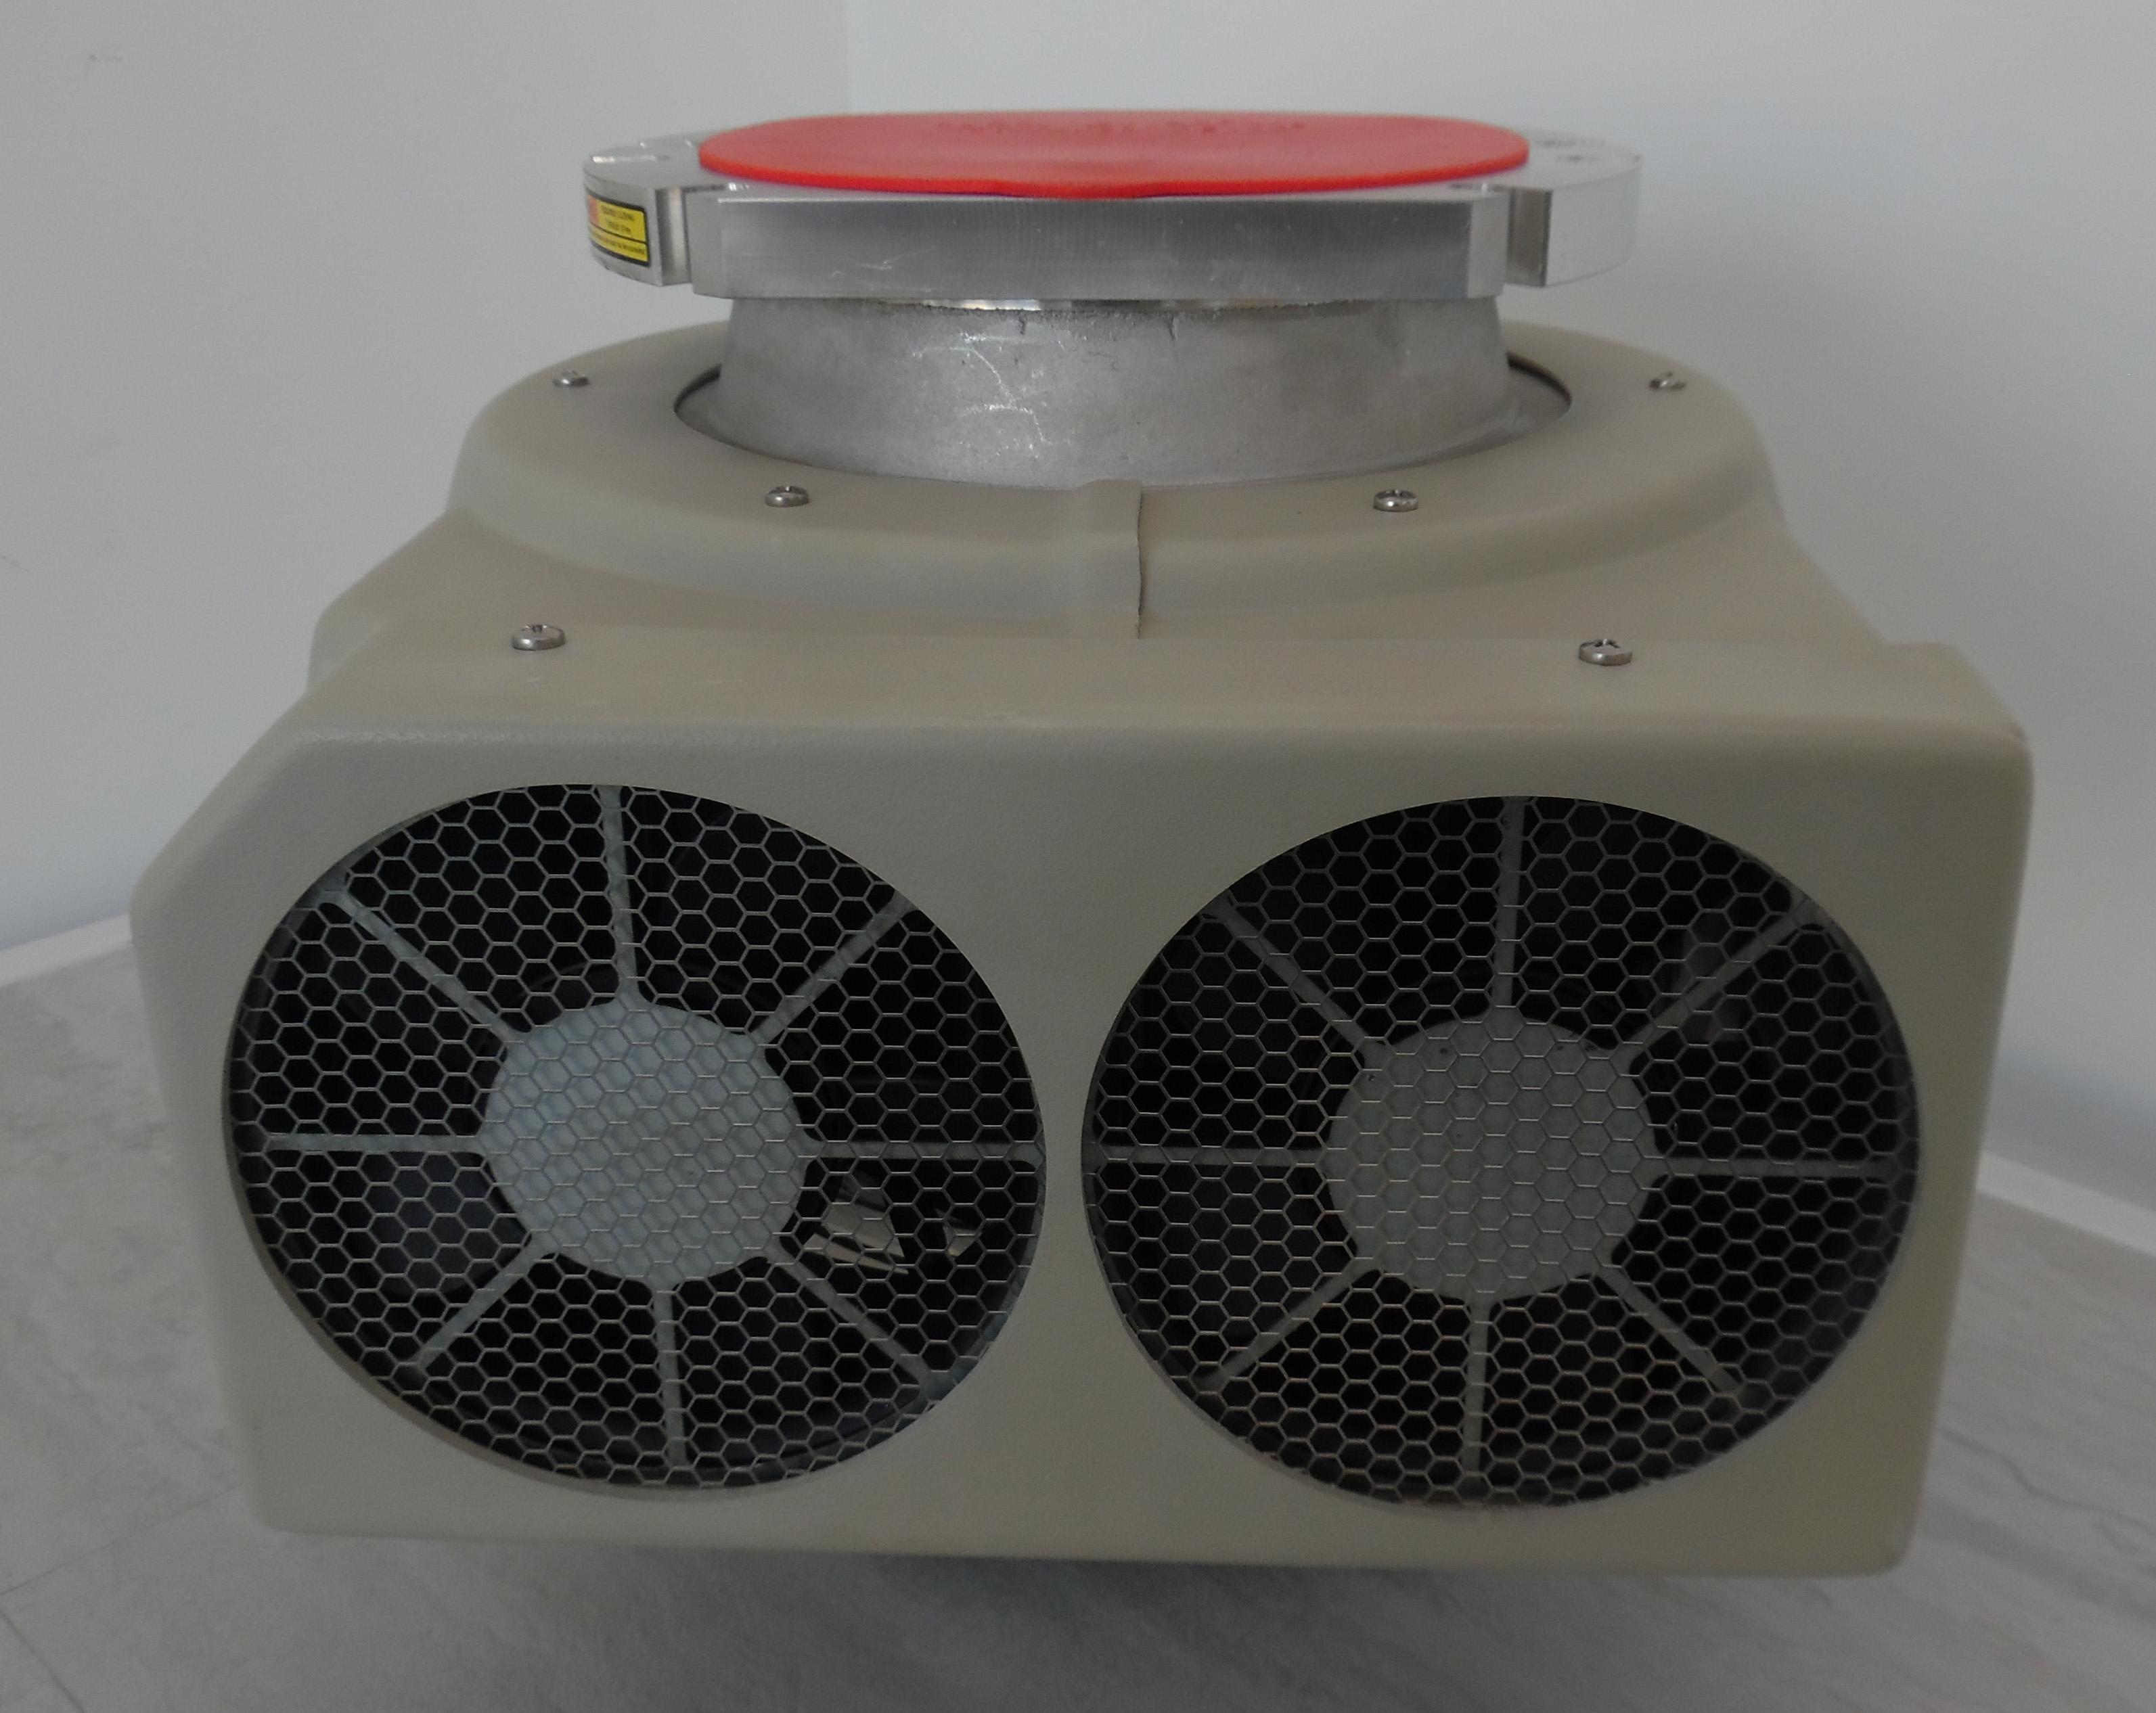 Agilent Varian TV801 ISOF Turbomolecular Pump, Rebuilt